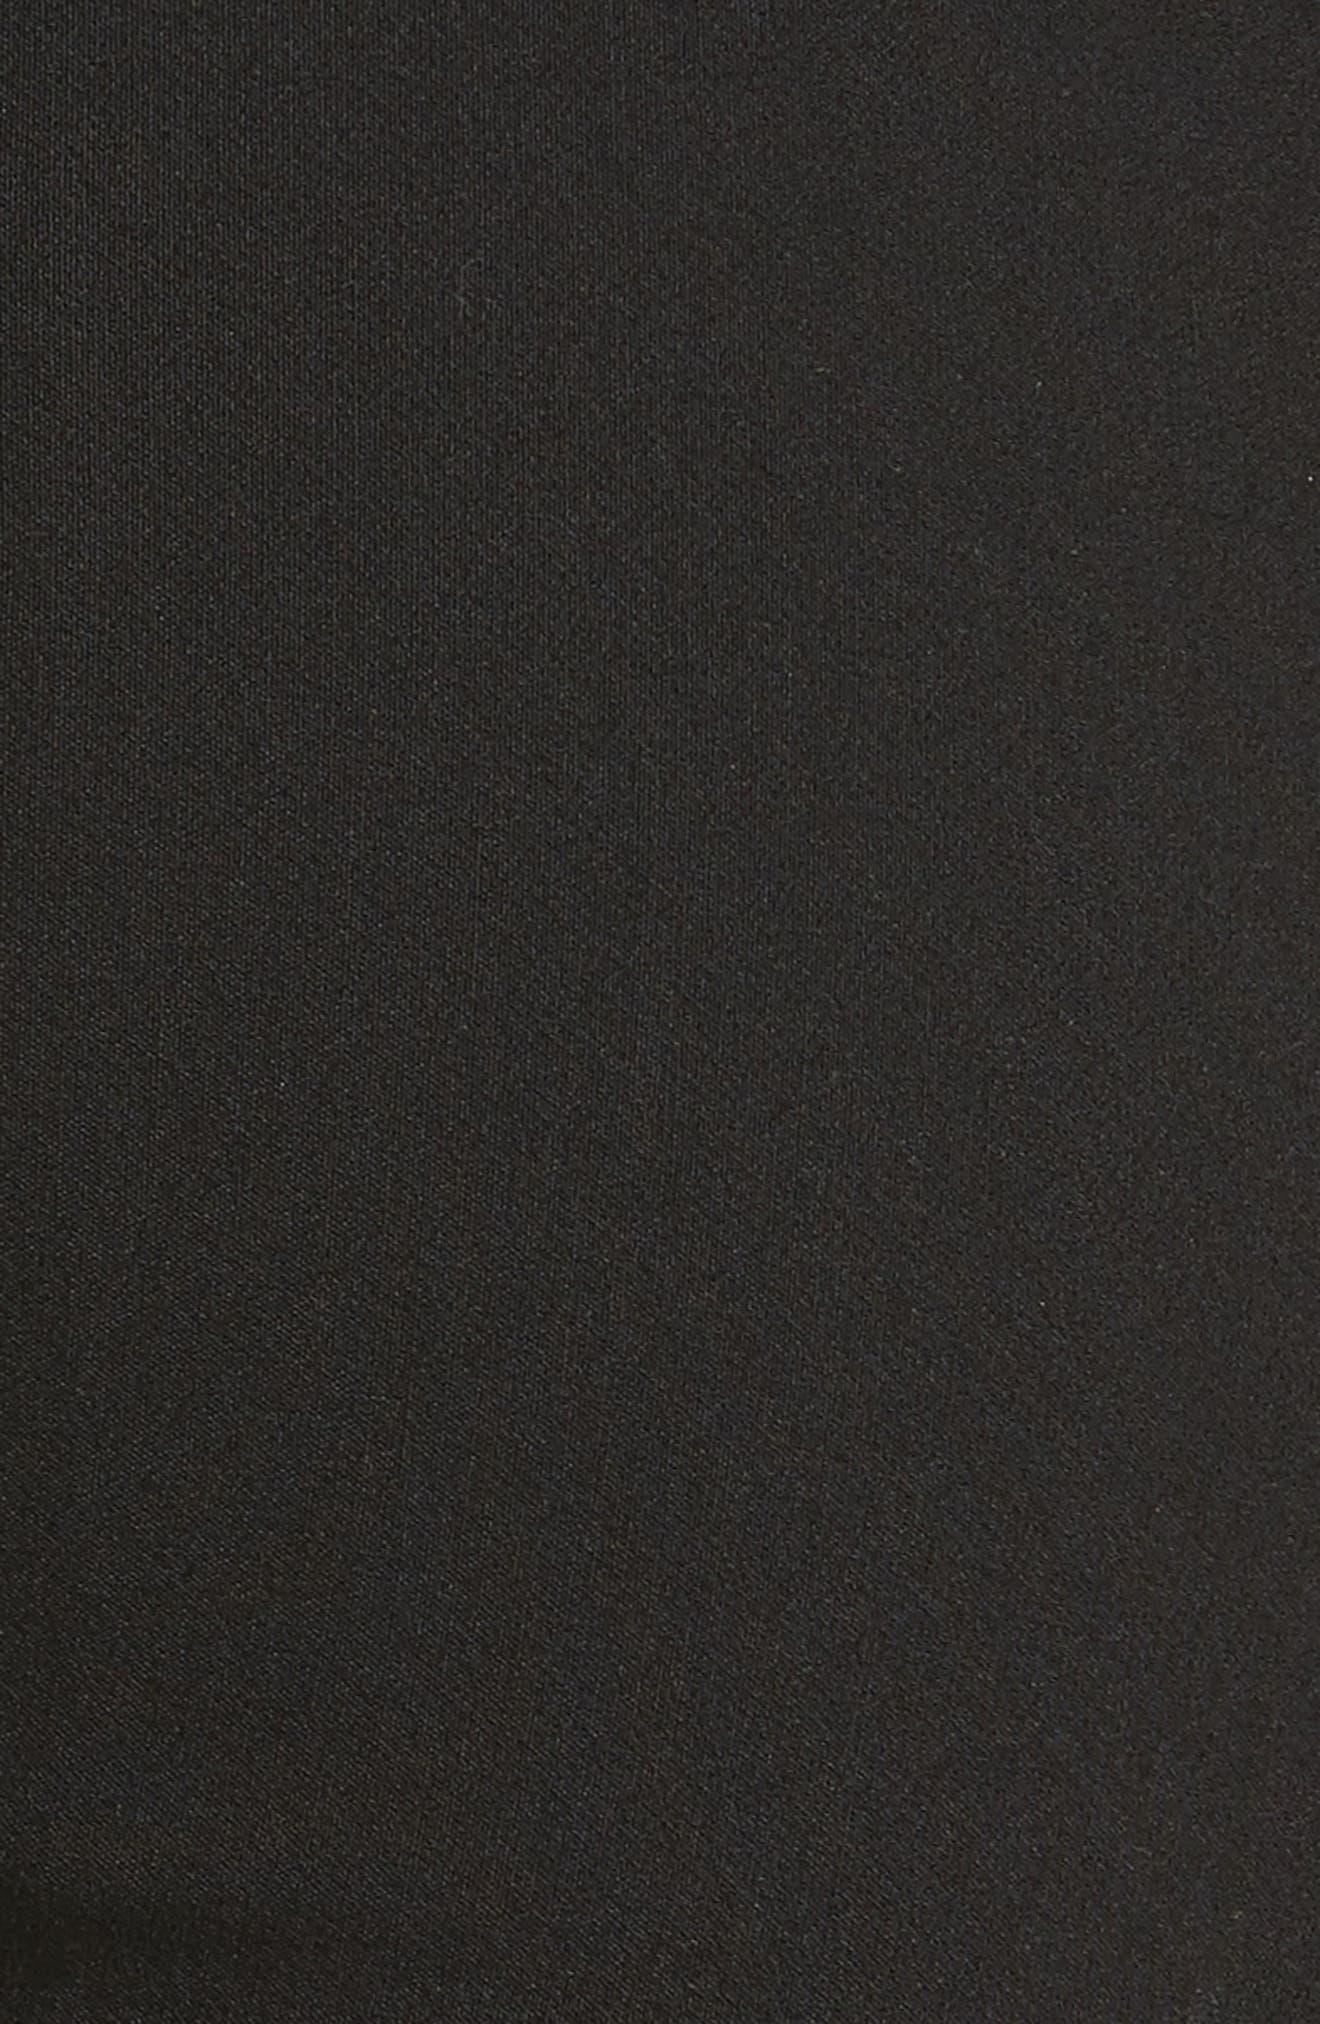 Crop Leggings,                             Alternate thumbnail 6, color,                             BLACK